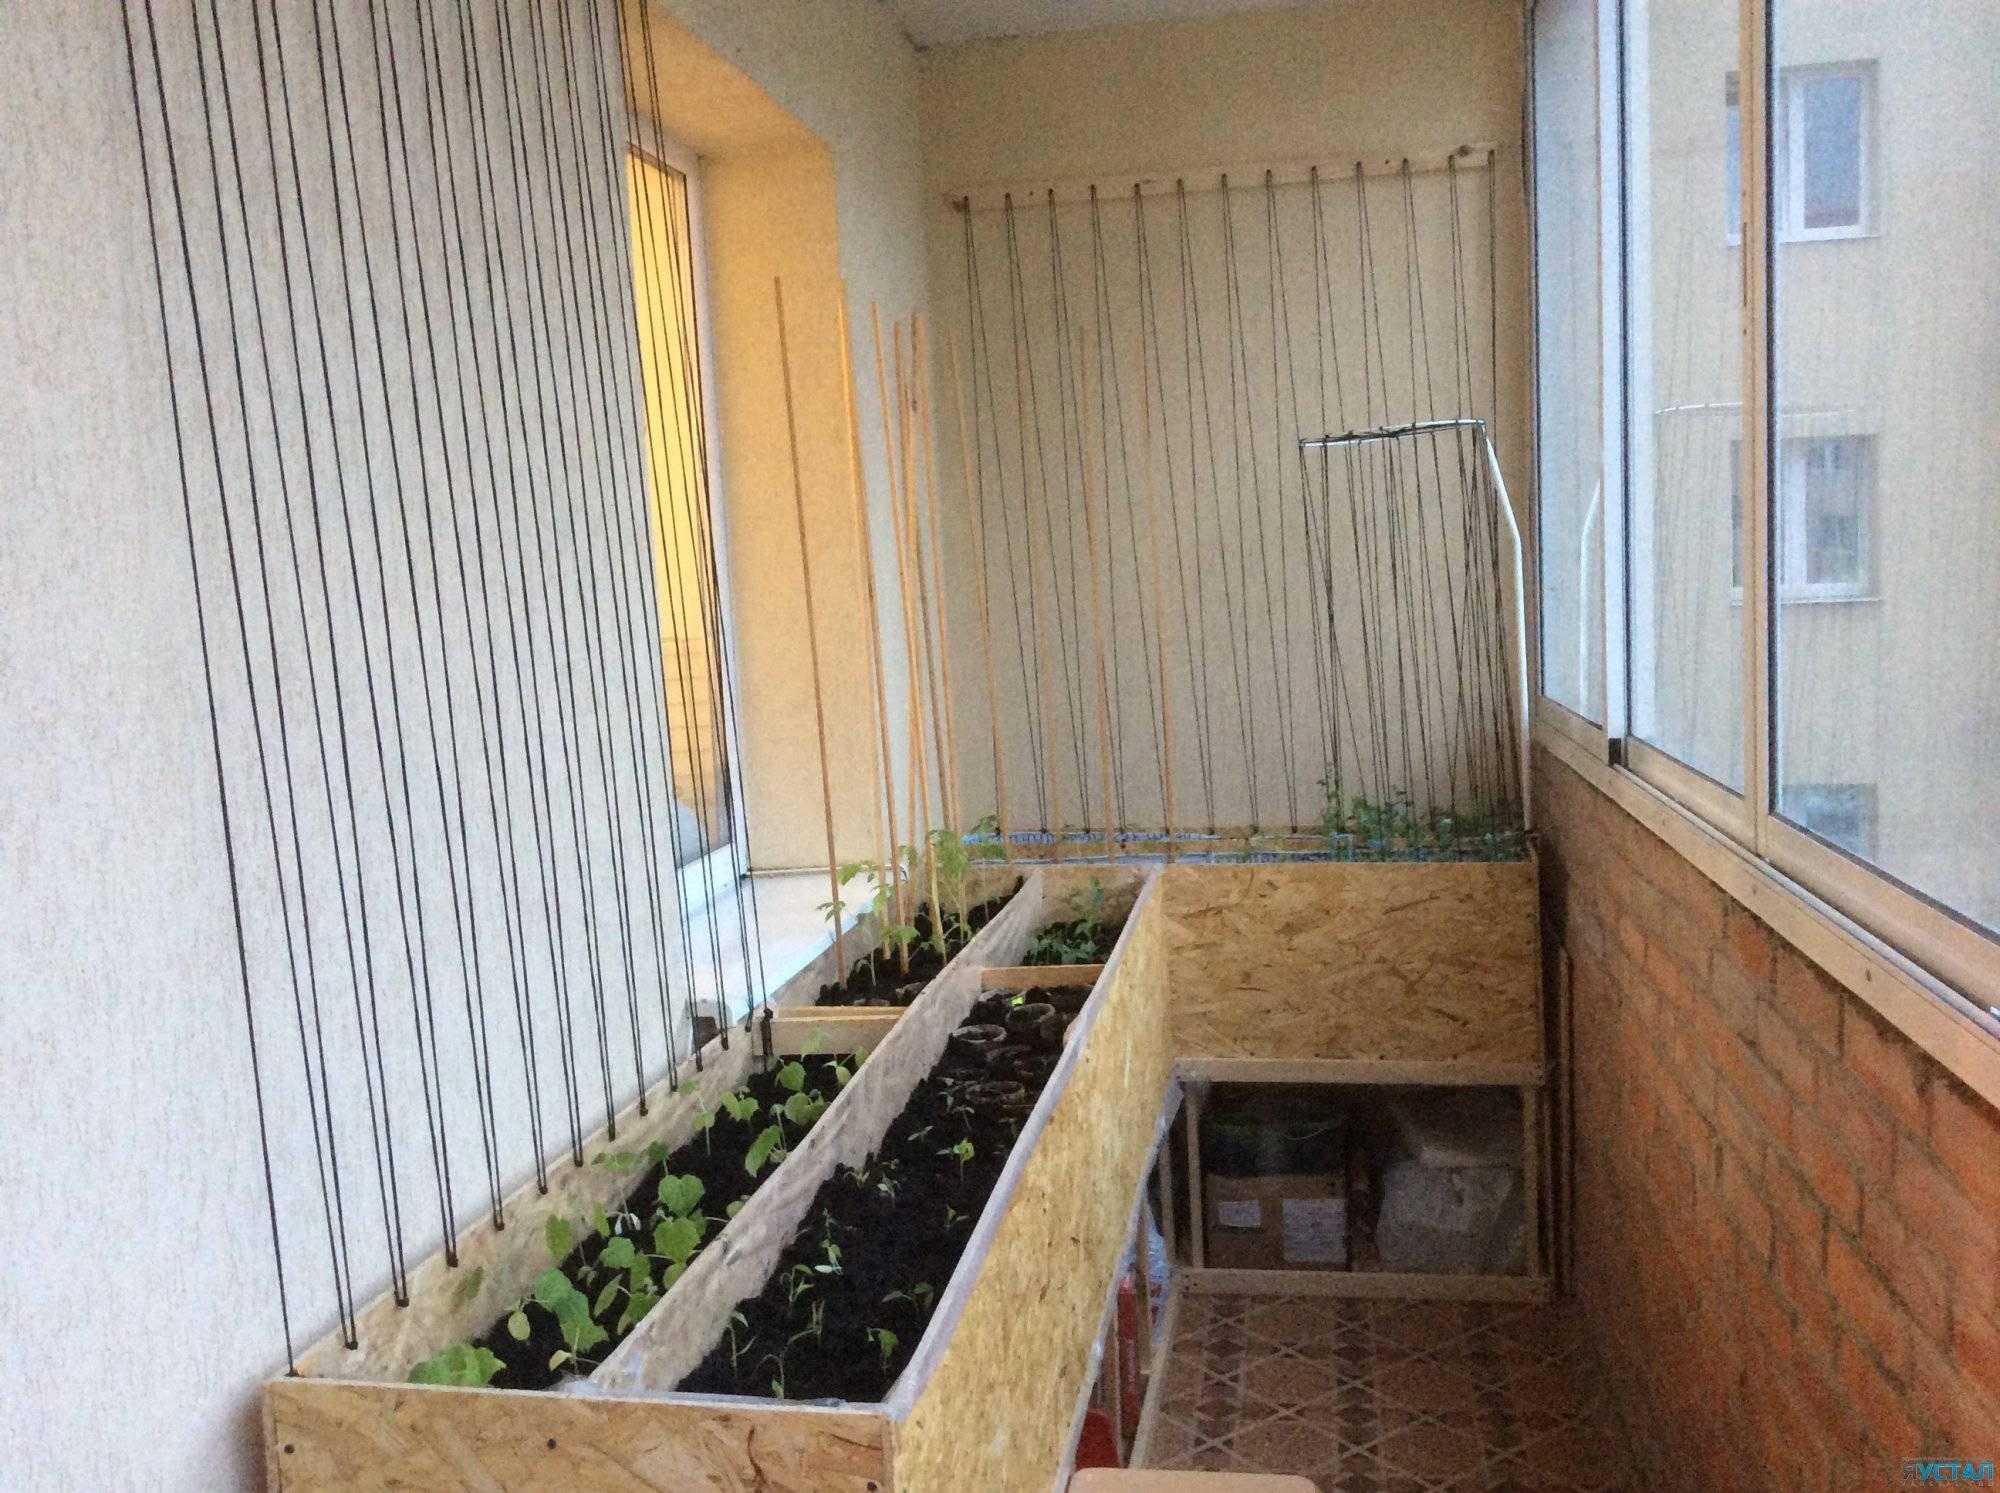 Зелень на балконе - хитрости жизни.